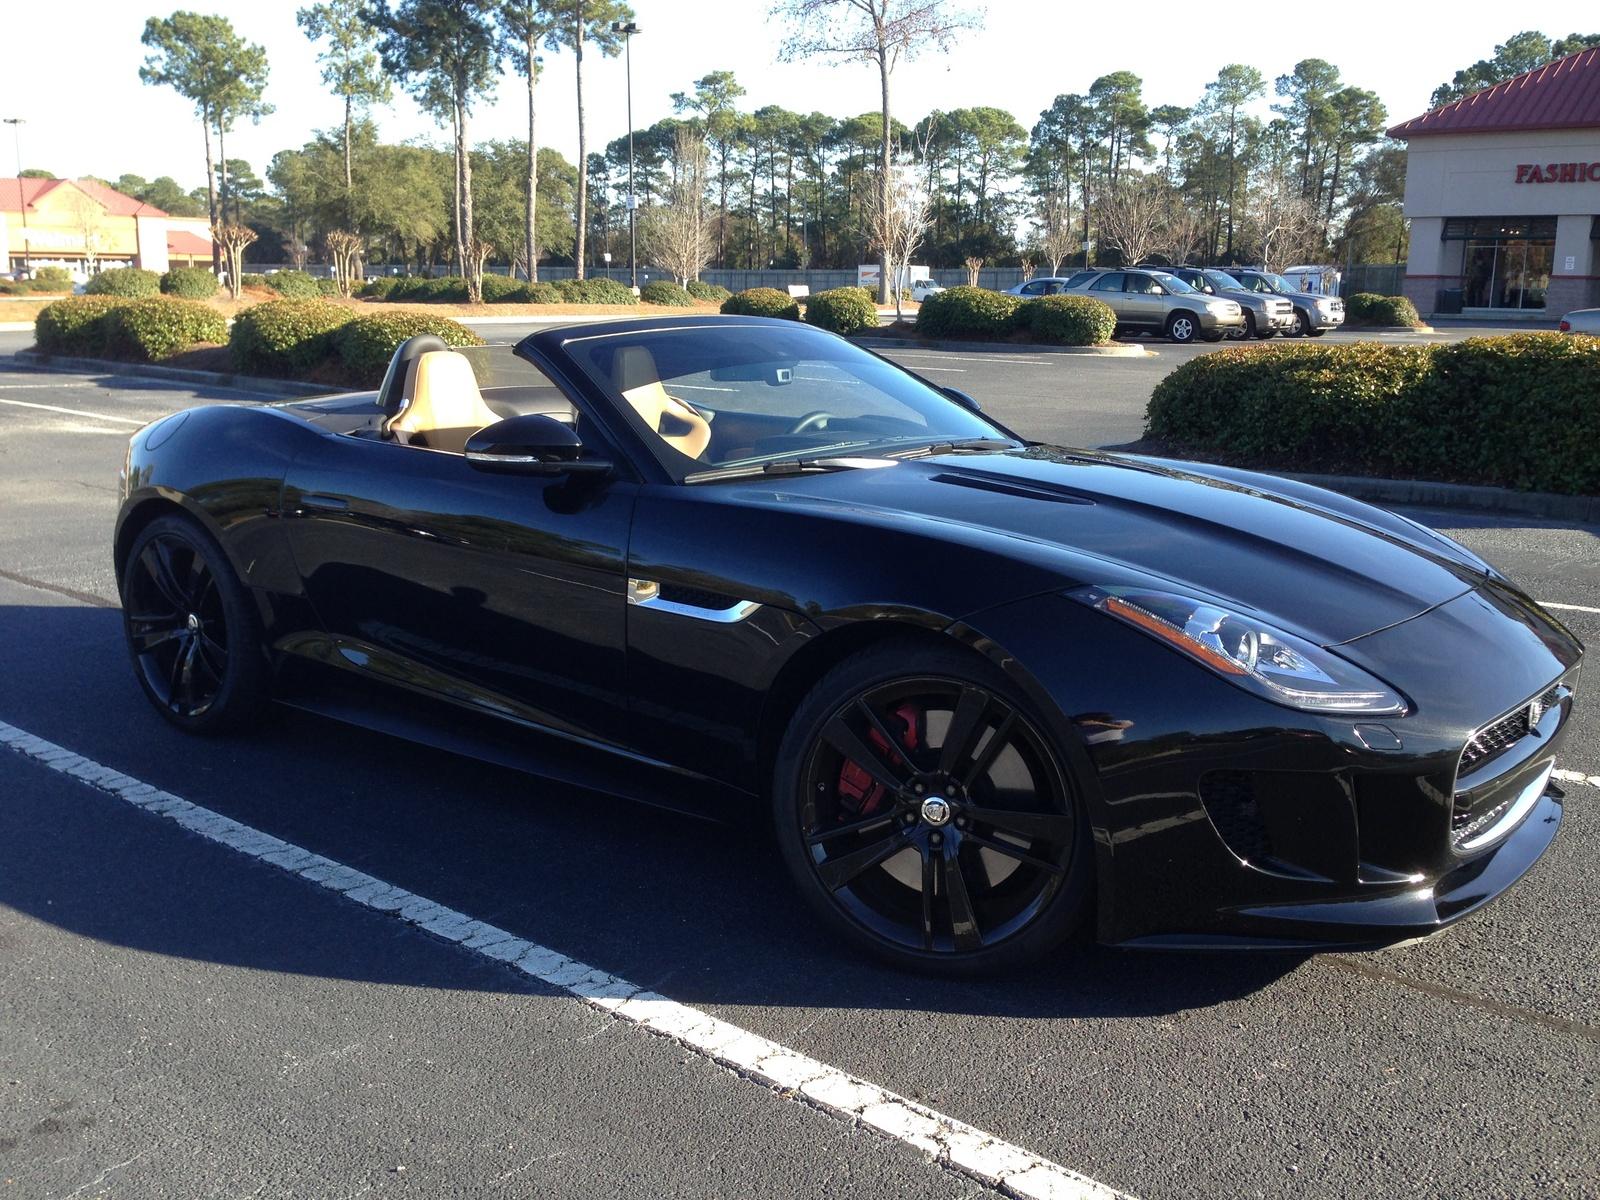 Test Drive: 2015 Jaguar F-TYPE